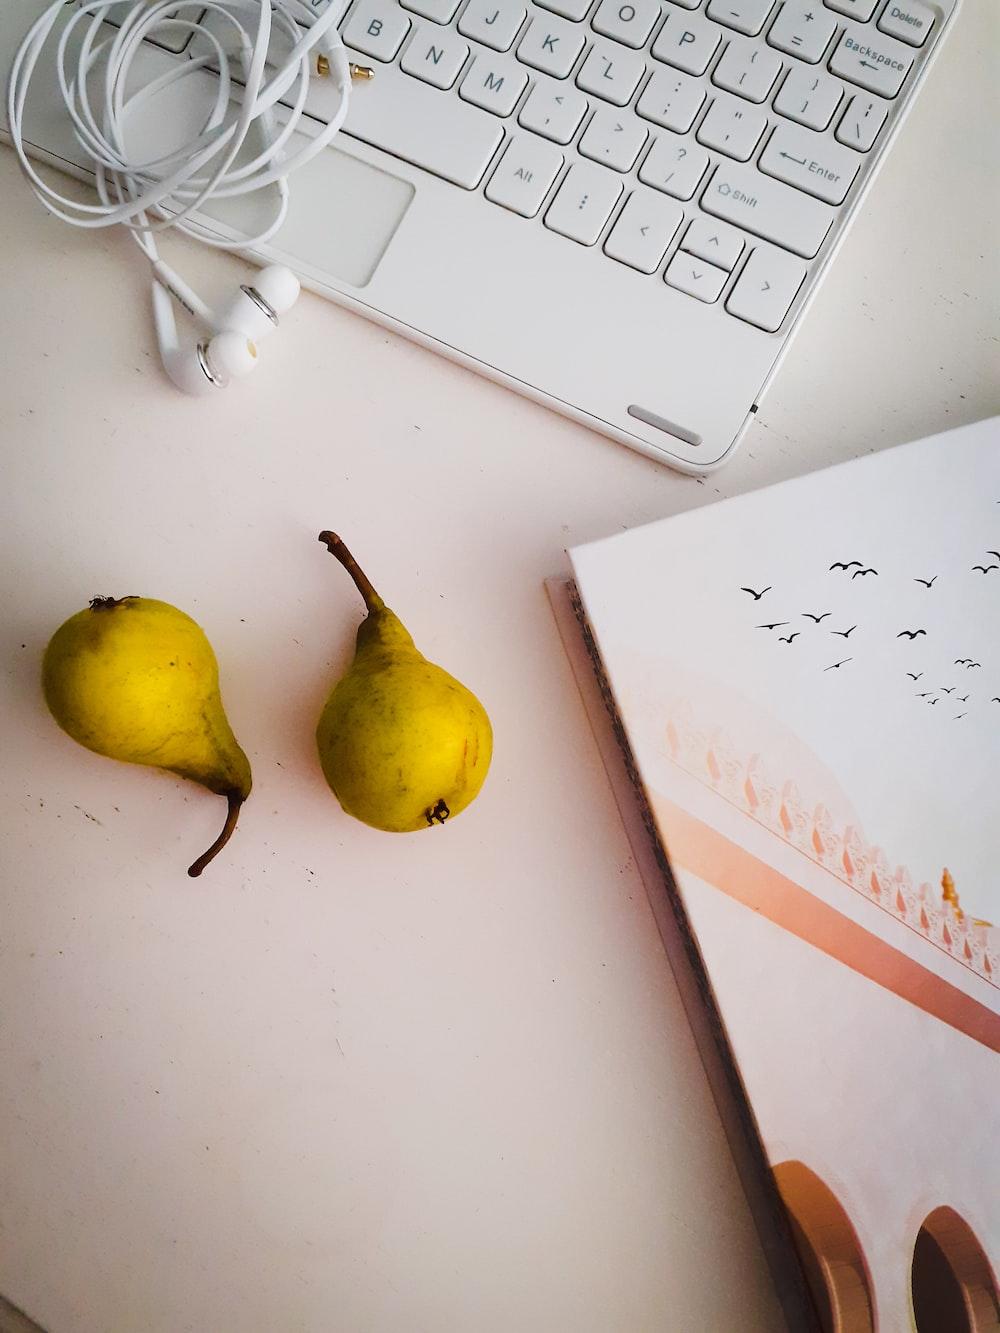 yellow round fruit beside white apple earpods